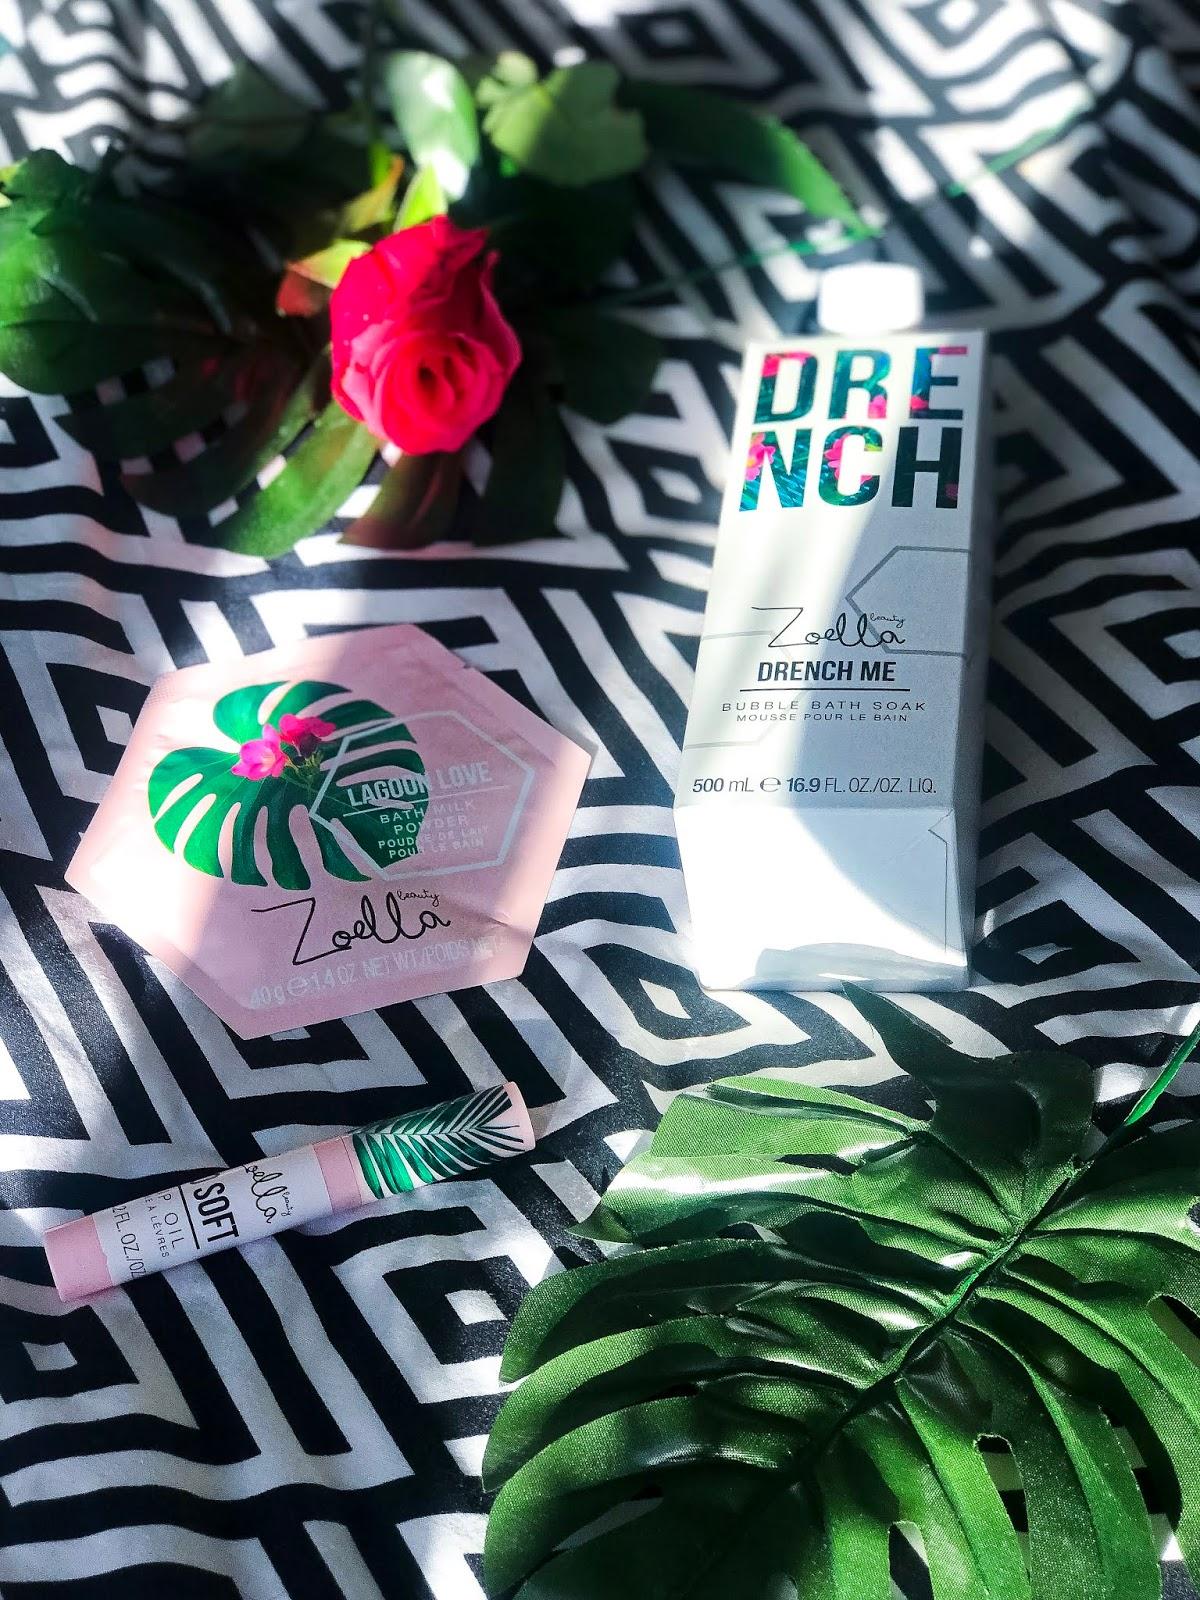 zoella beauty splash botanics review lip oil drench lagoon love